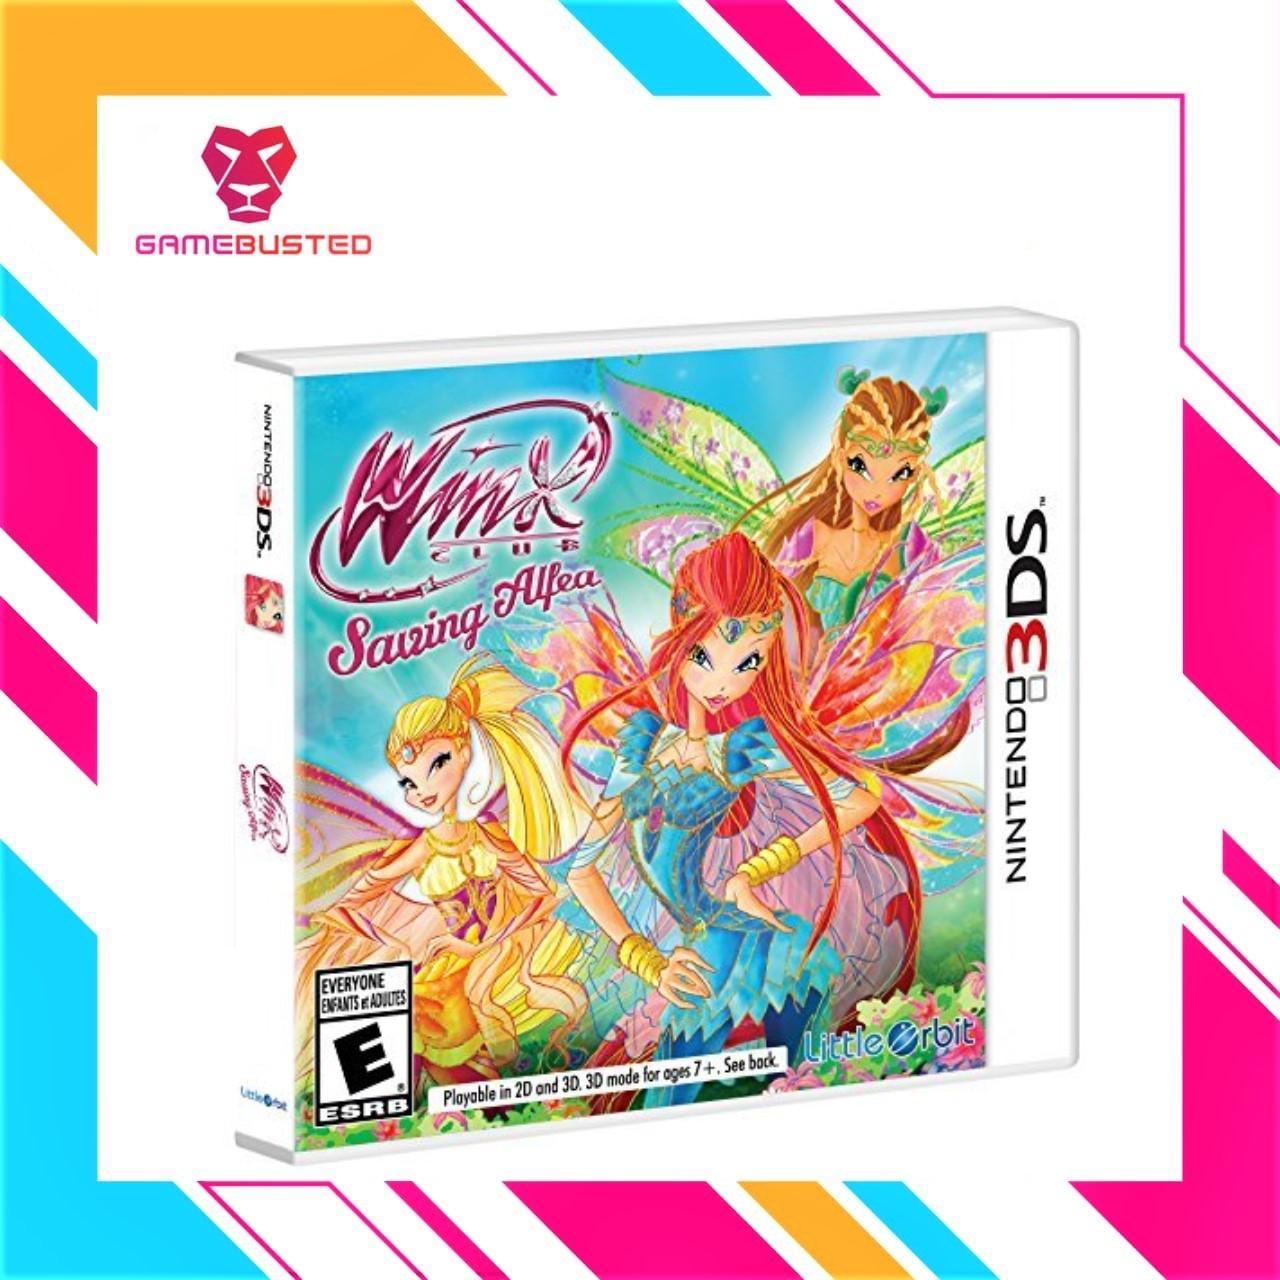 3DS Winx Club: Saving Alfea